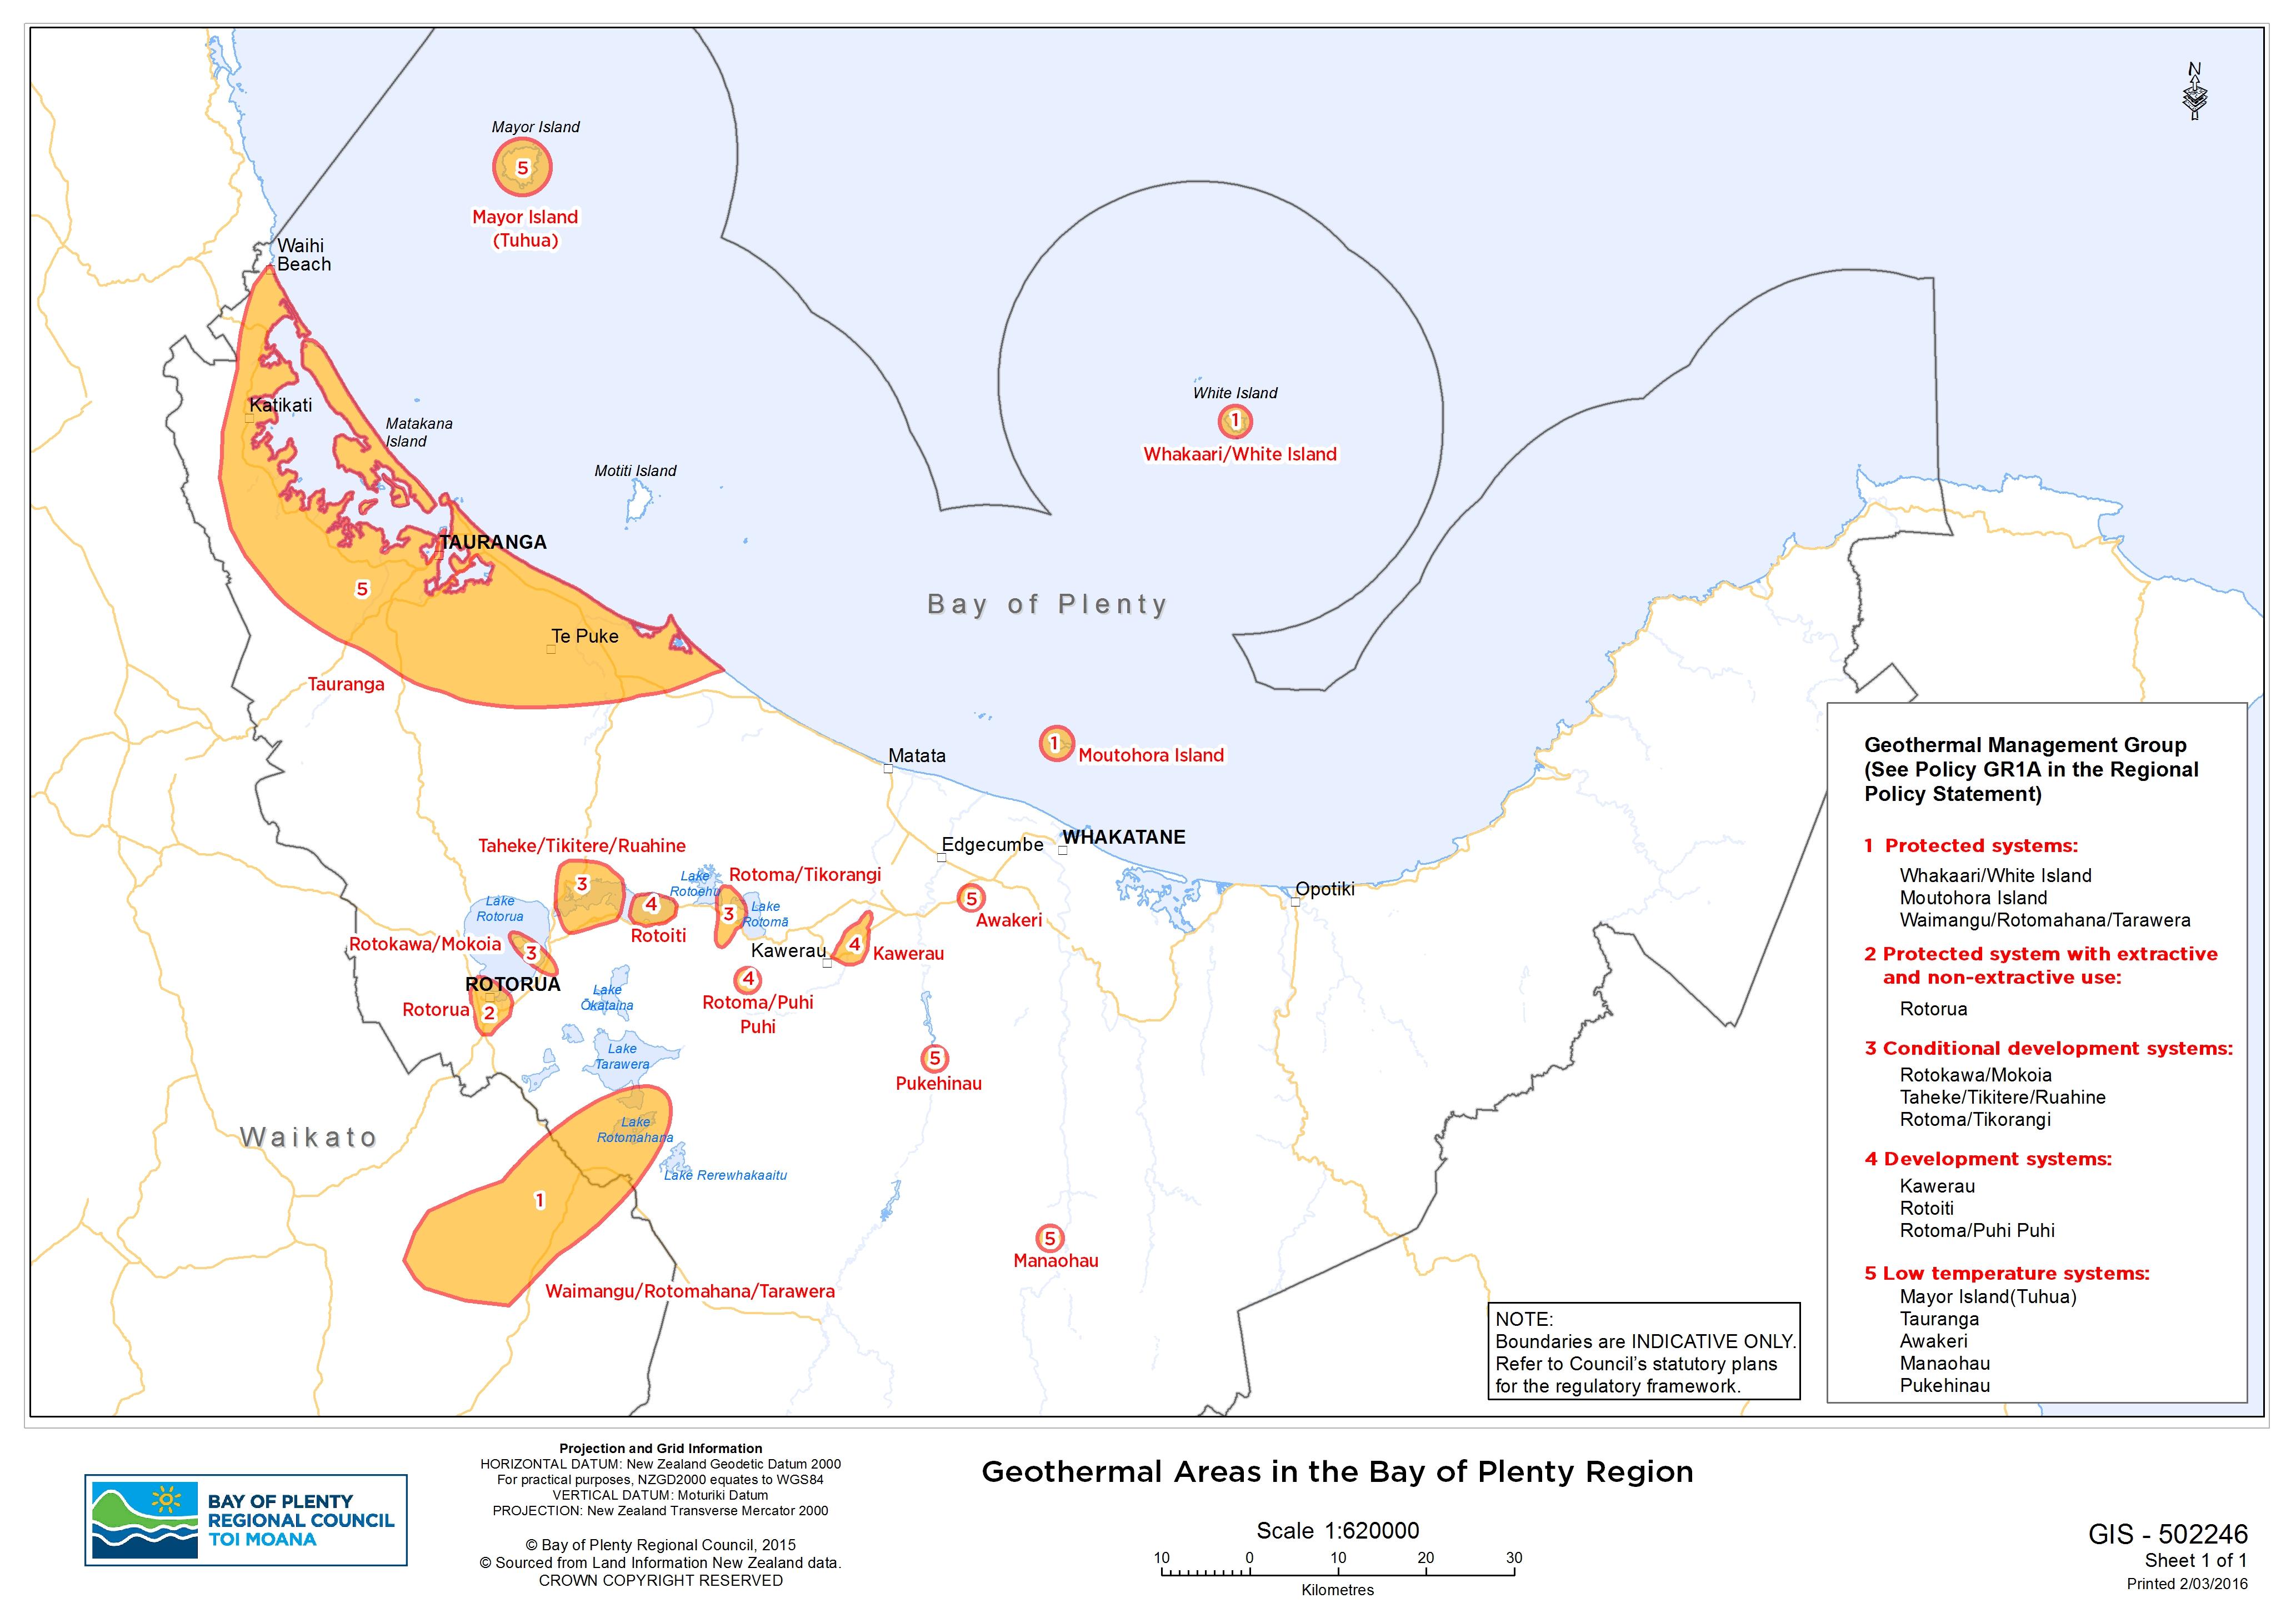 Nz Geothermal Fields Association Dry Steam Power Plant Diagram Bay Of Plenty Regional Council Systems Map